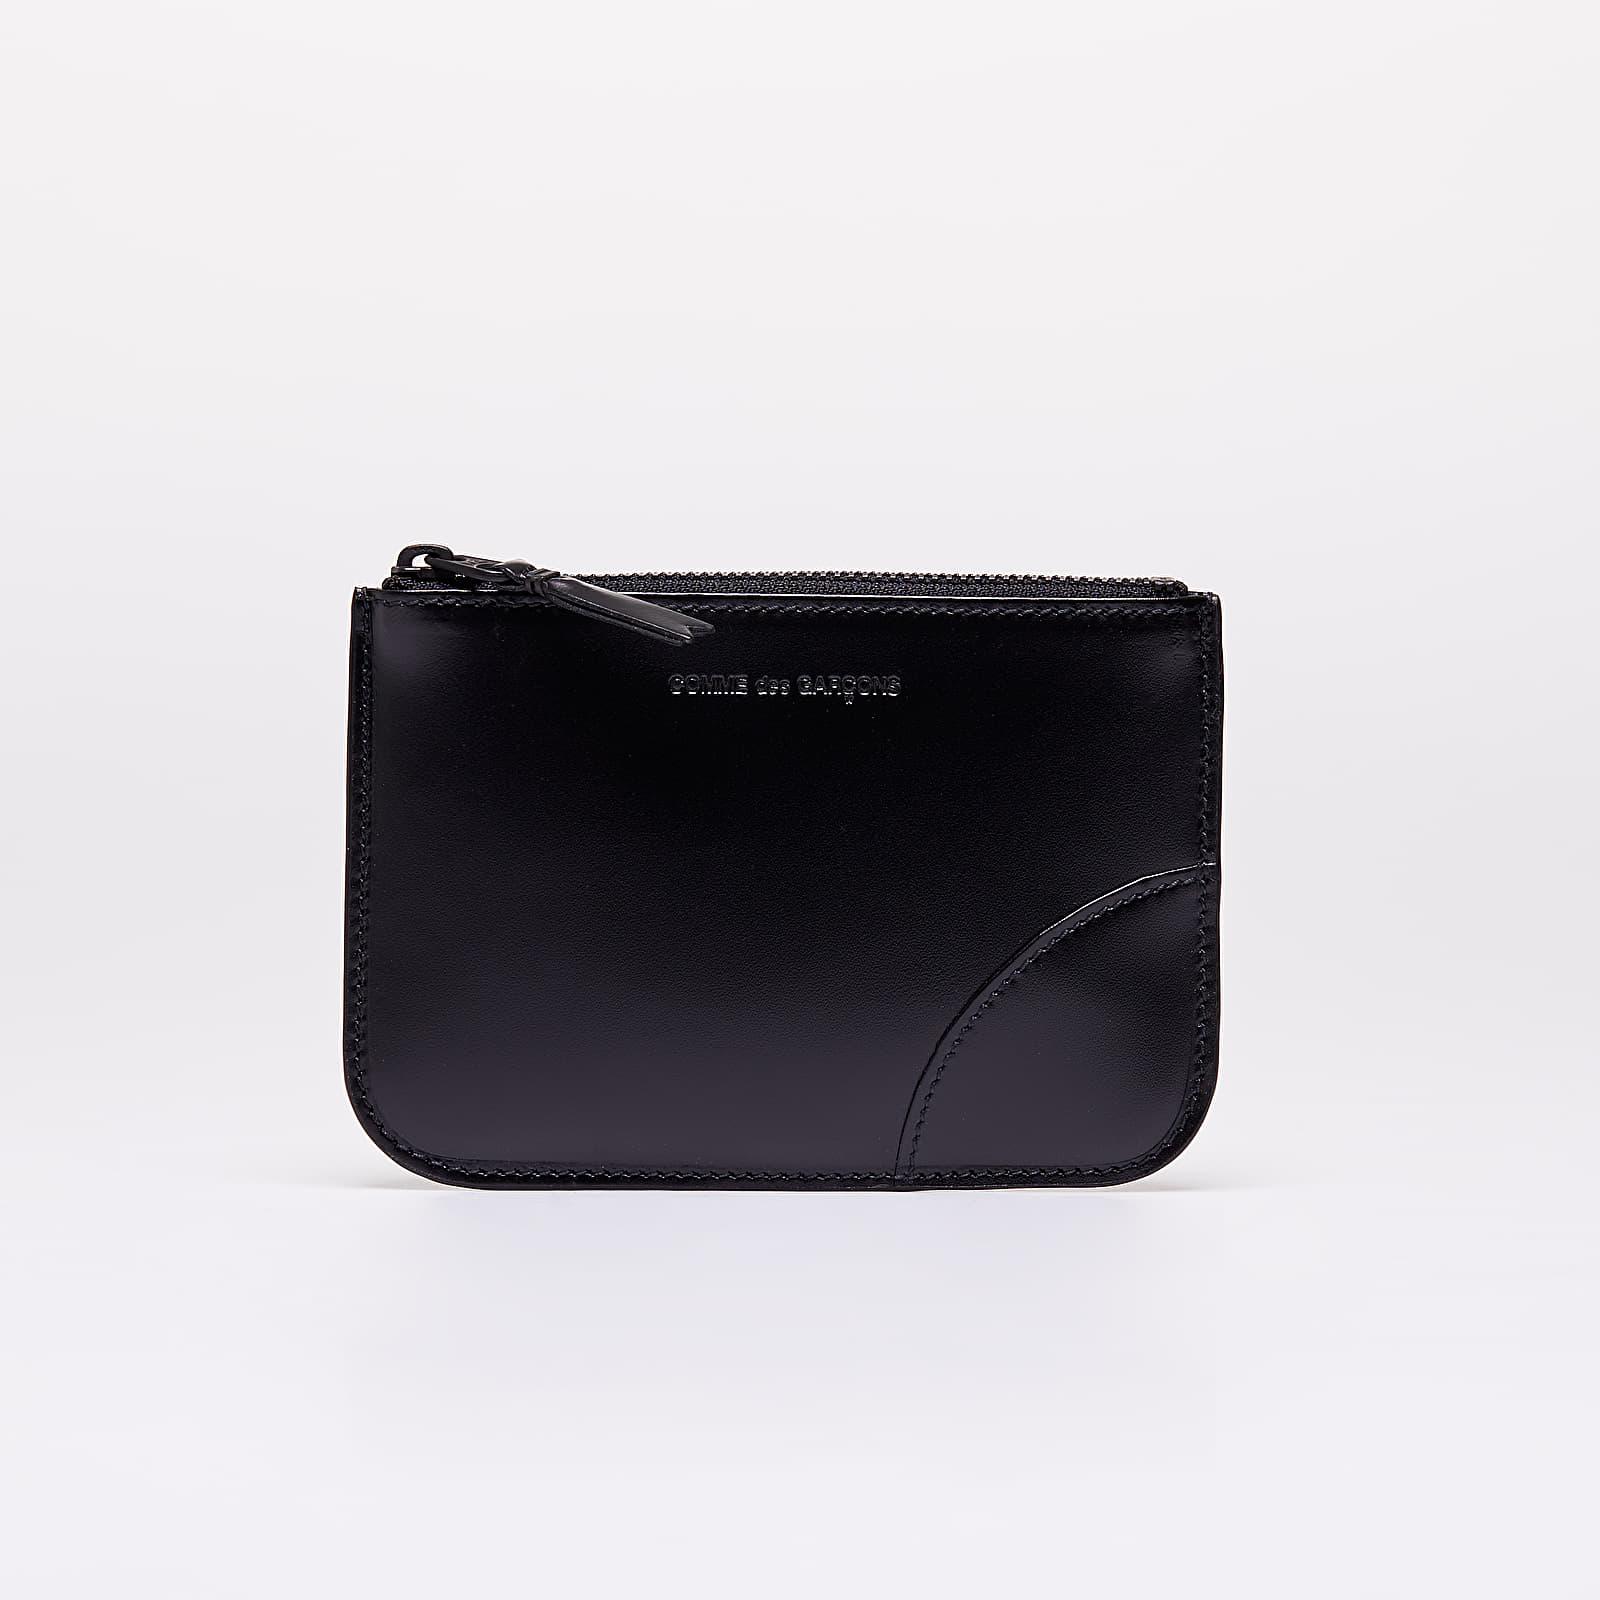 Denarnice Comme des Garçons Wallet Very Black